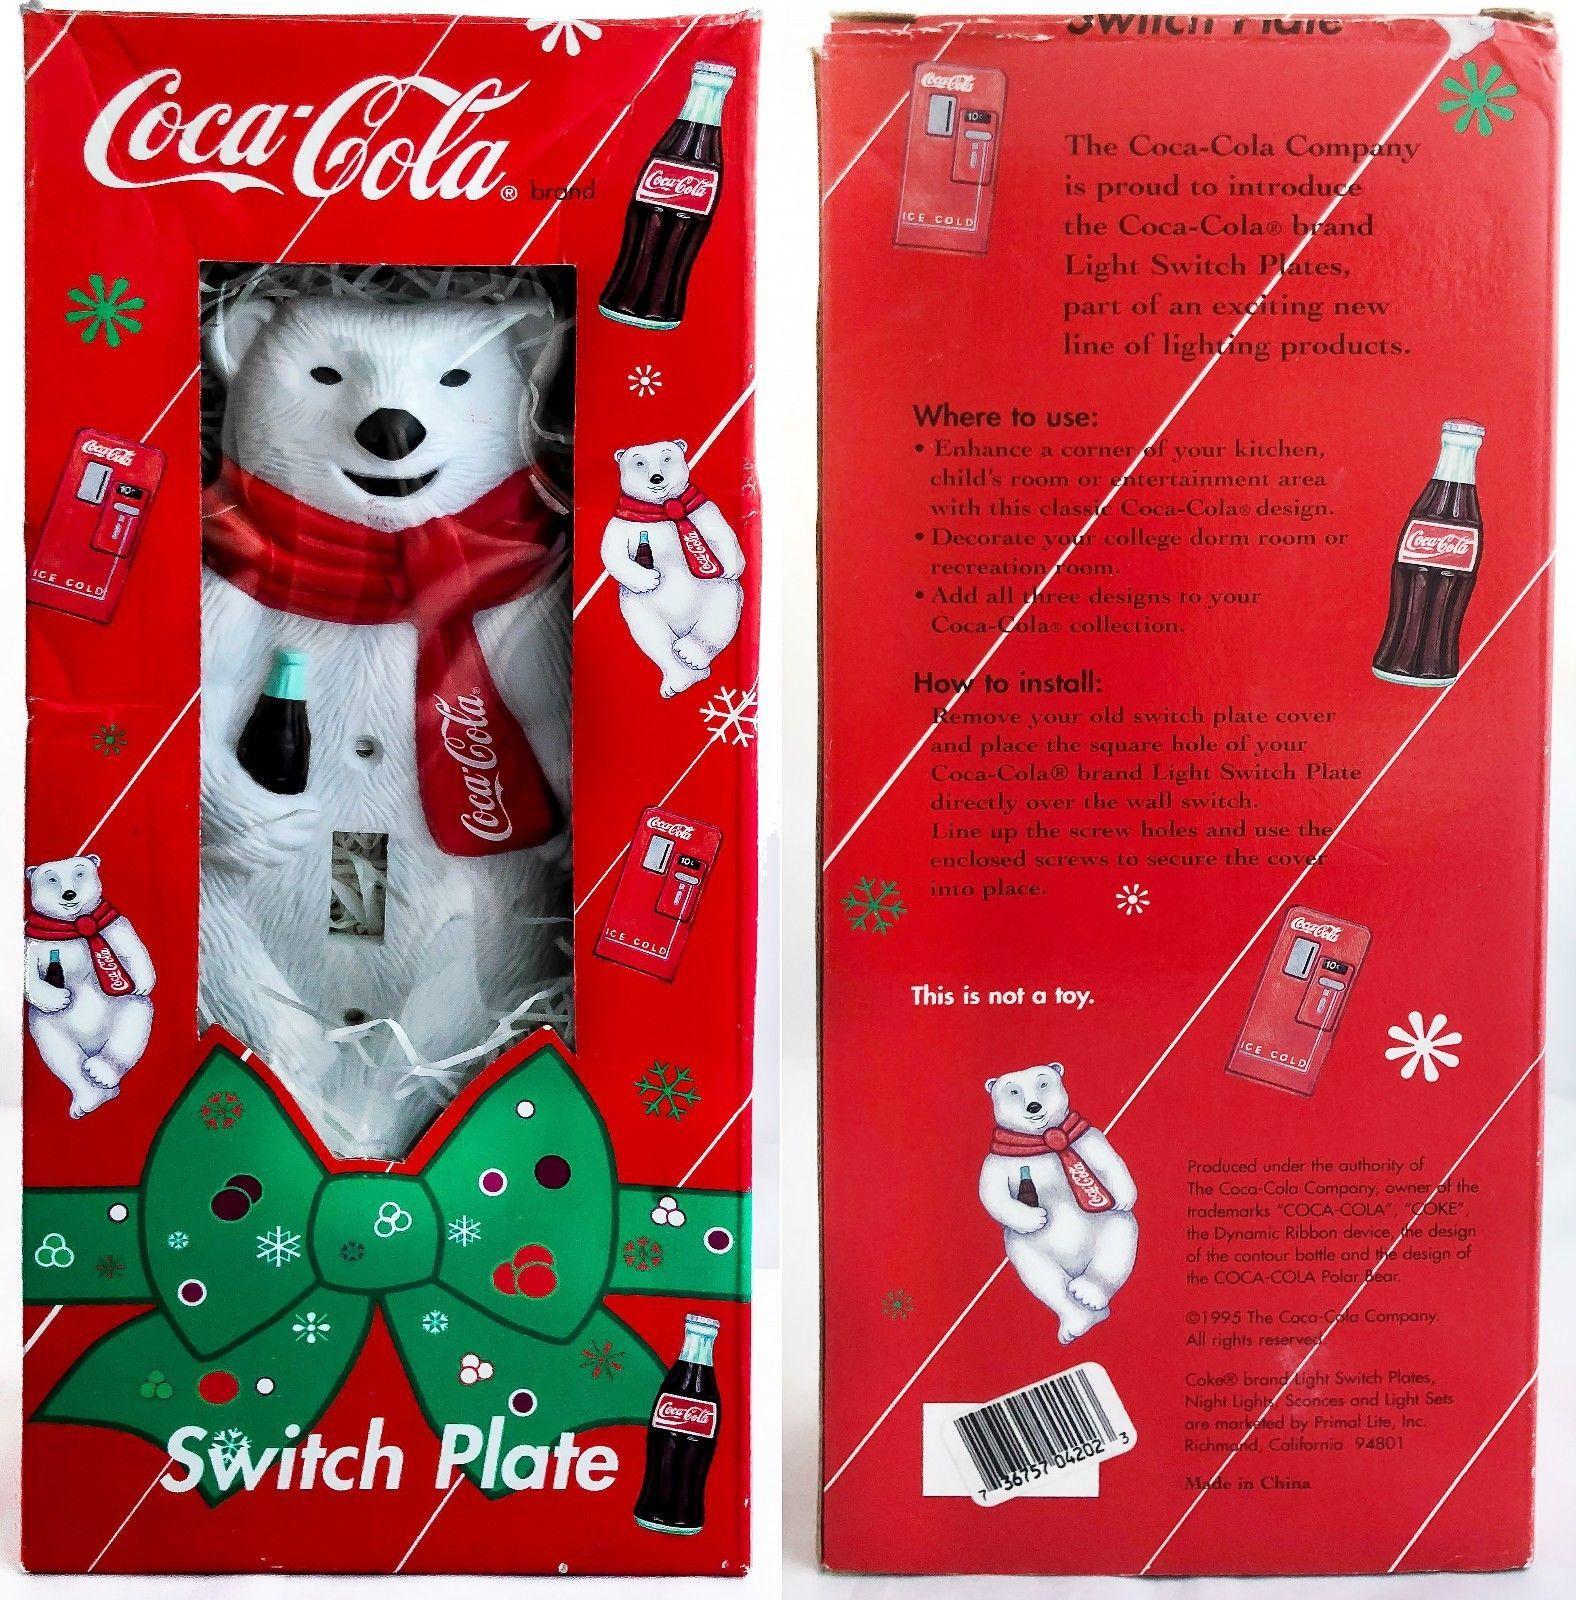 Coca-Cola Polar Bear Snowboarding Coke Christmas Enamel Vintage New in Package